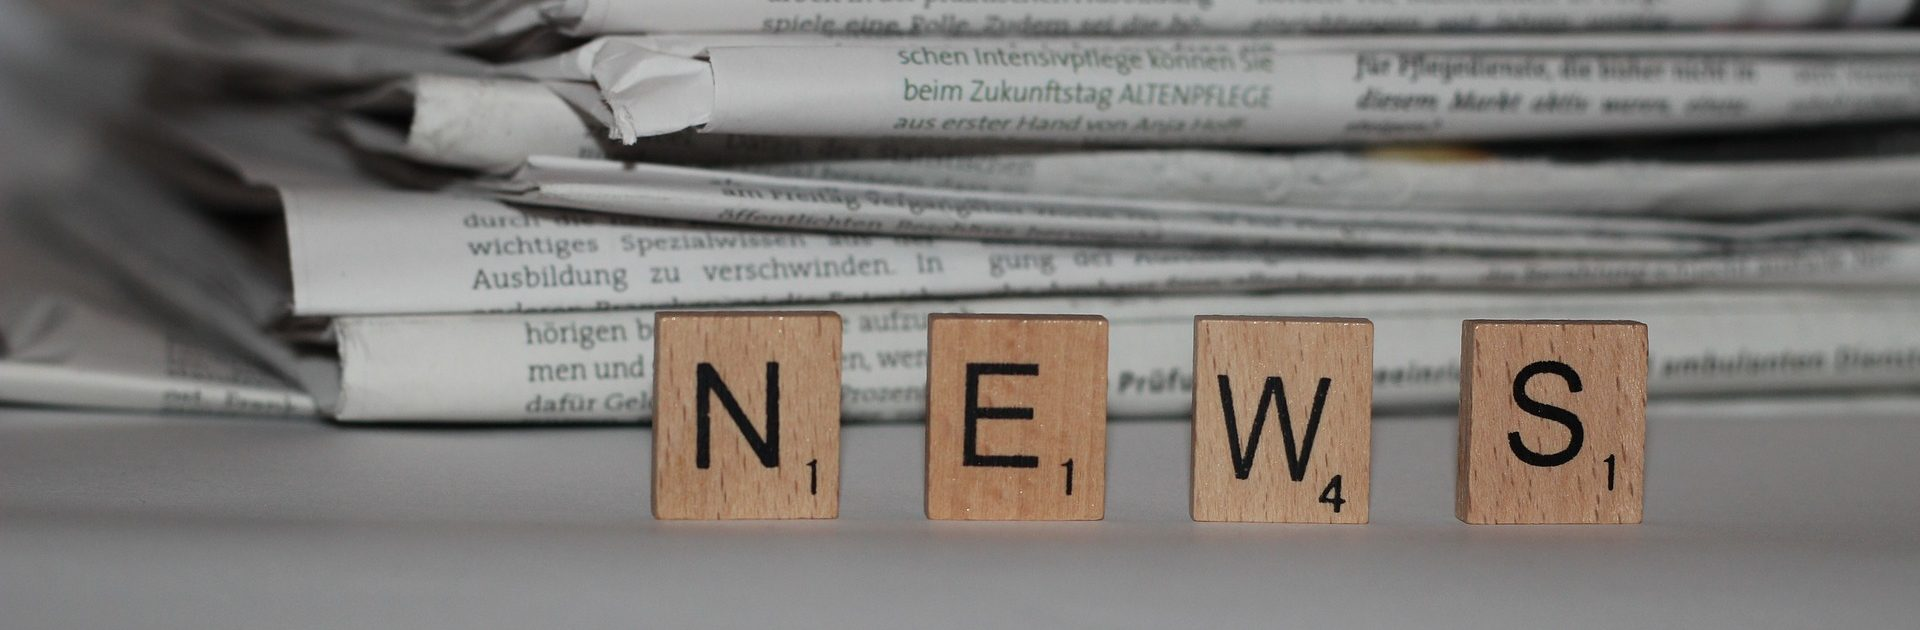 news-Michael Bußmann Pixabay 1920x630